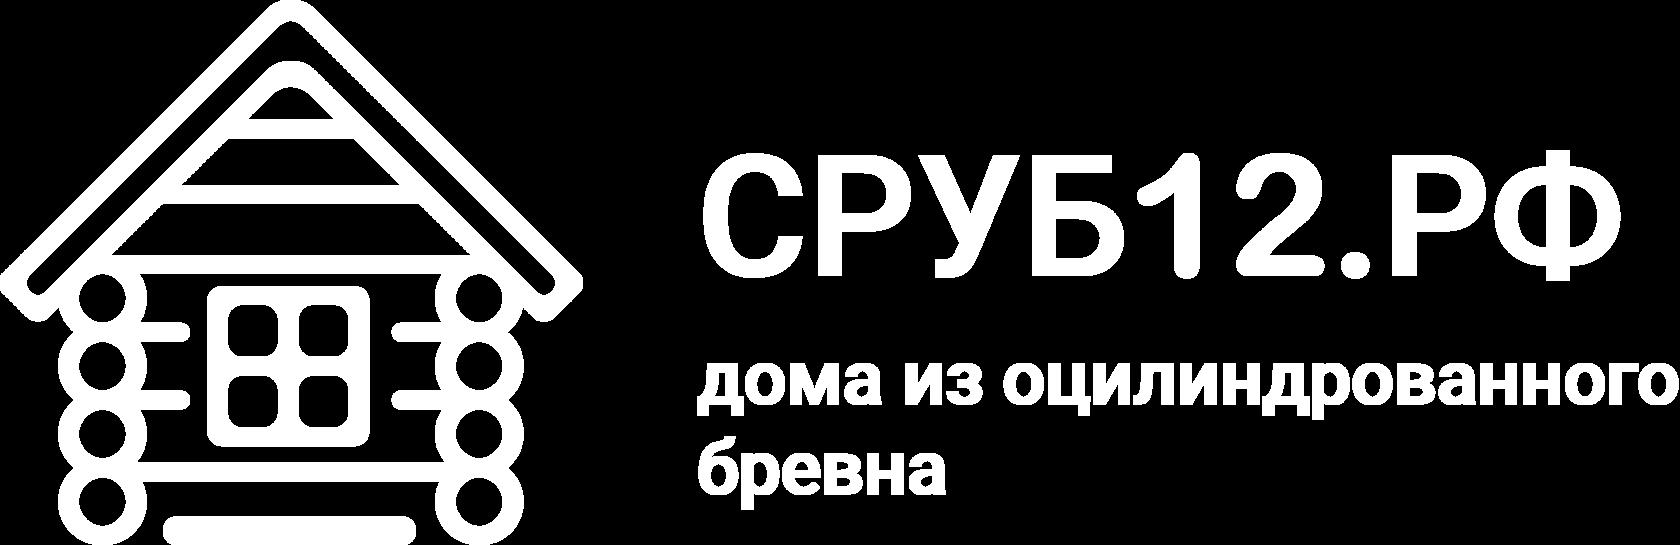 СРУБ12.РФ